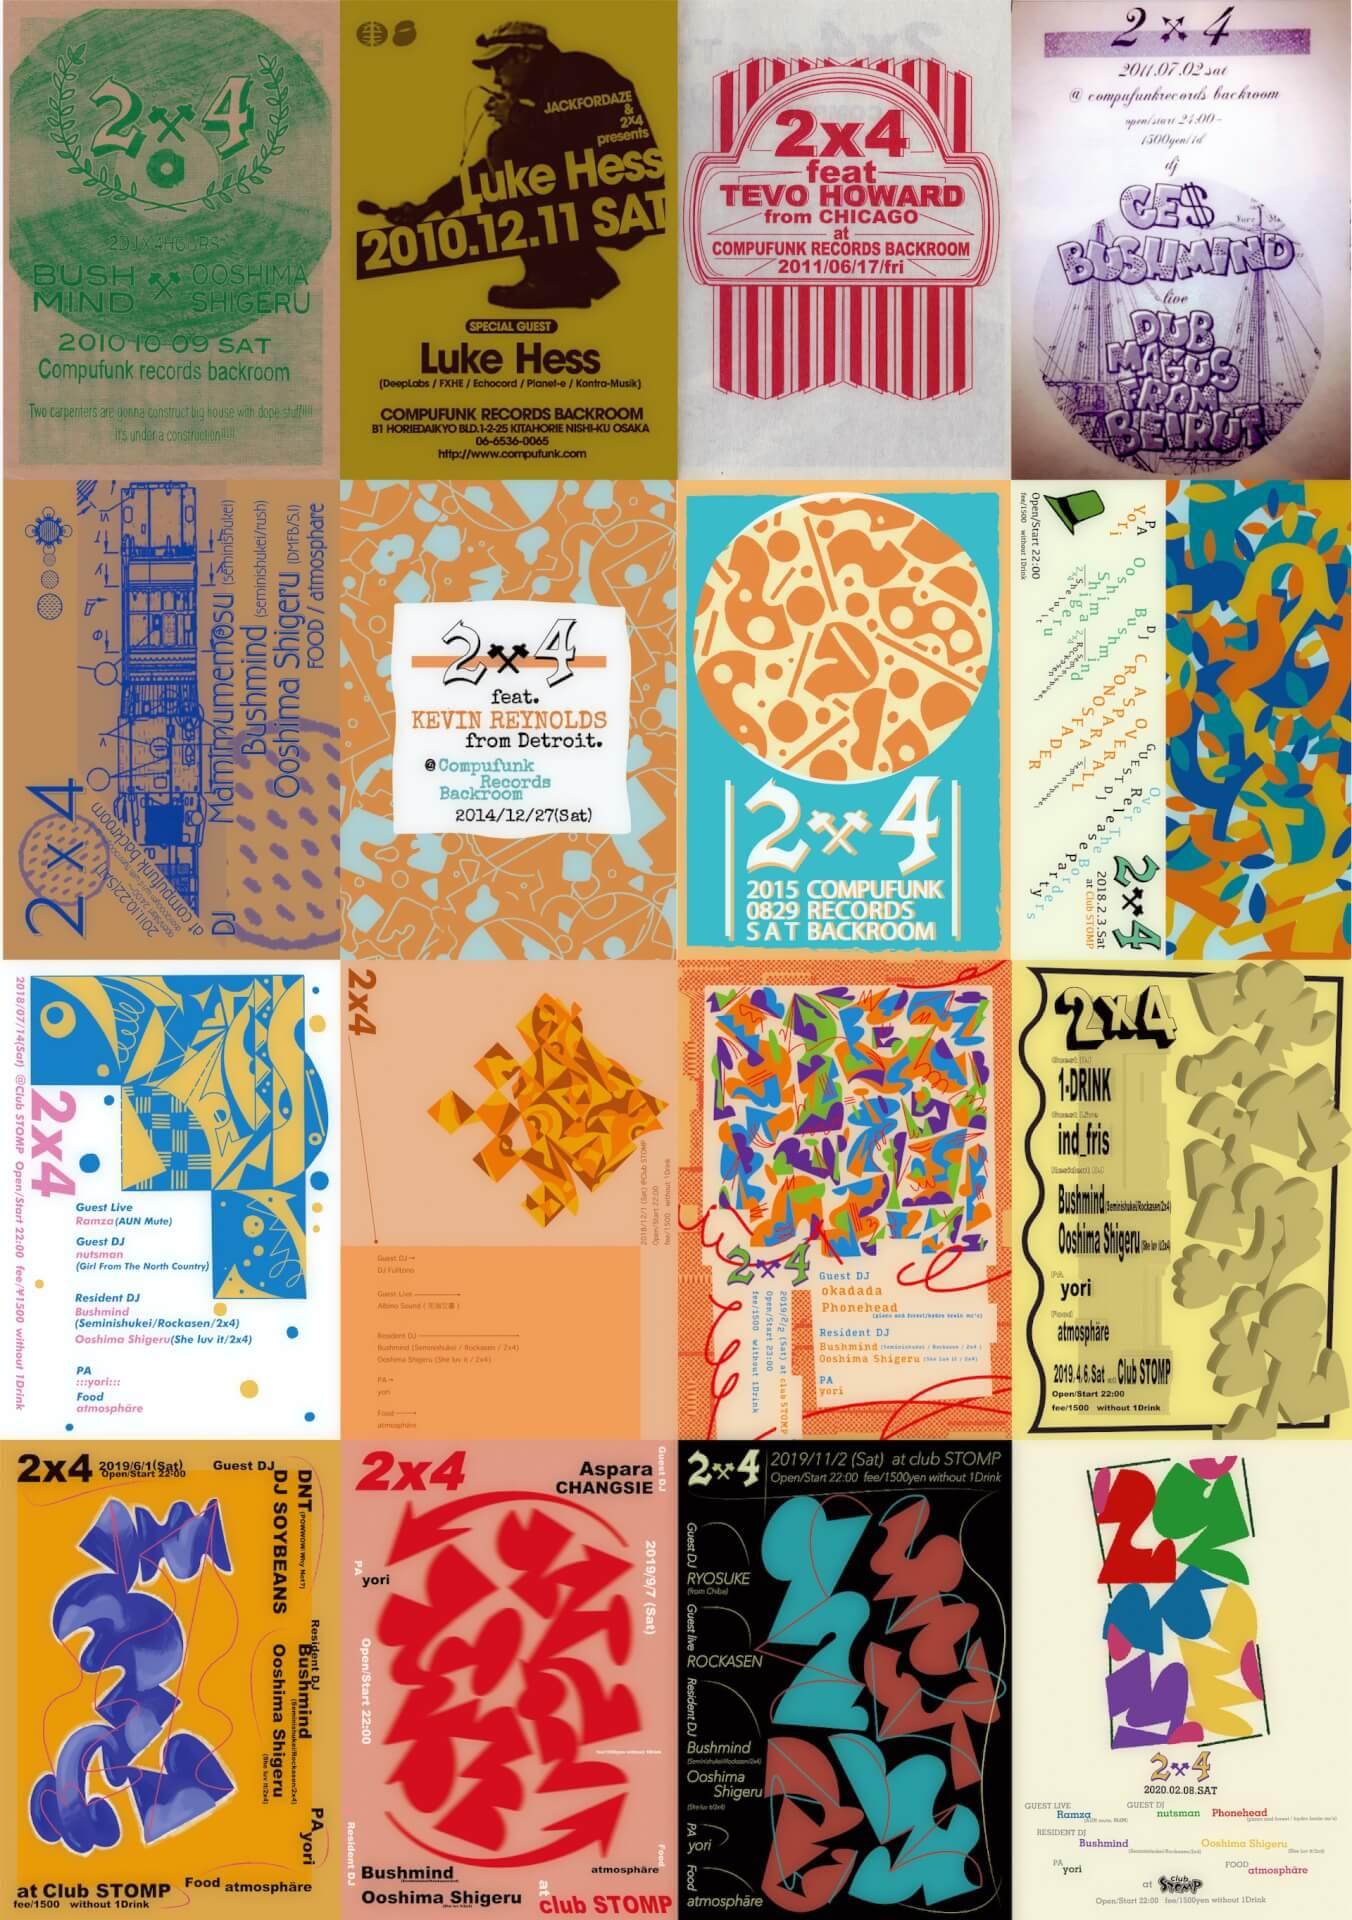 BushmindとOoshima Shigeruによる10周年目の<2×4>ラストパーティーにRamza、nutsman、Phoneheadがゲスト出演 music200206_2x4last_2